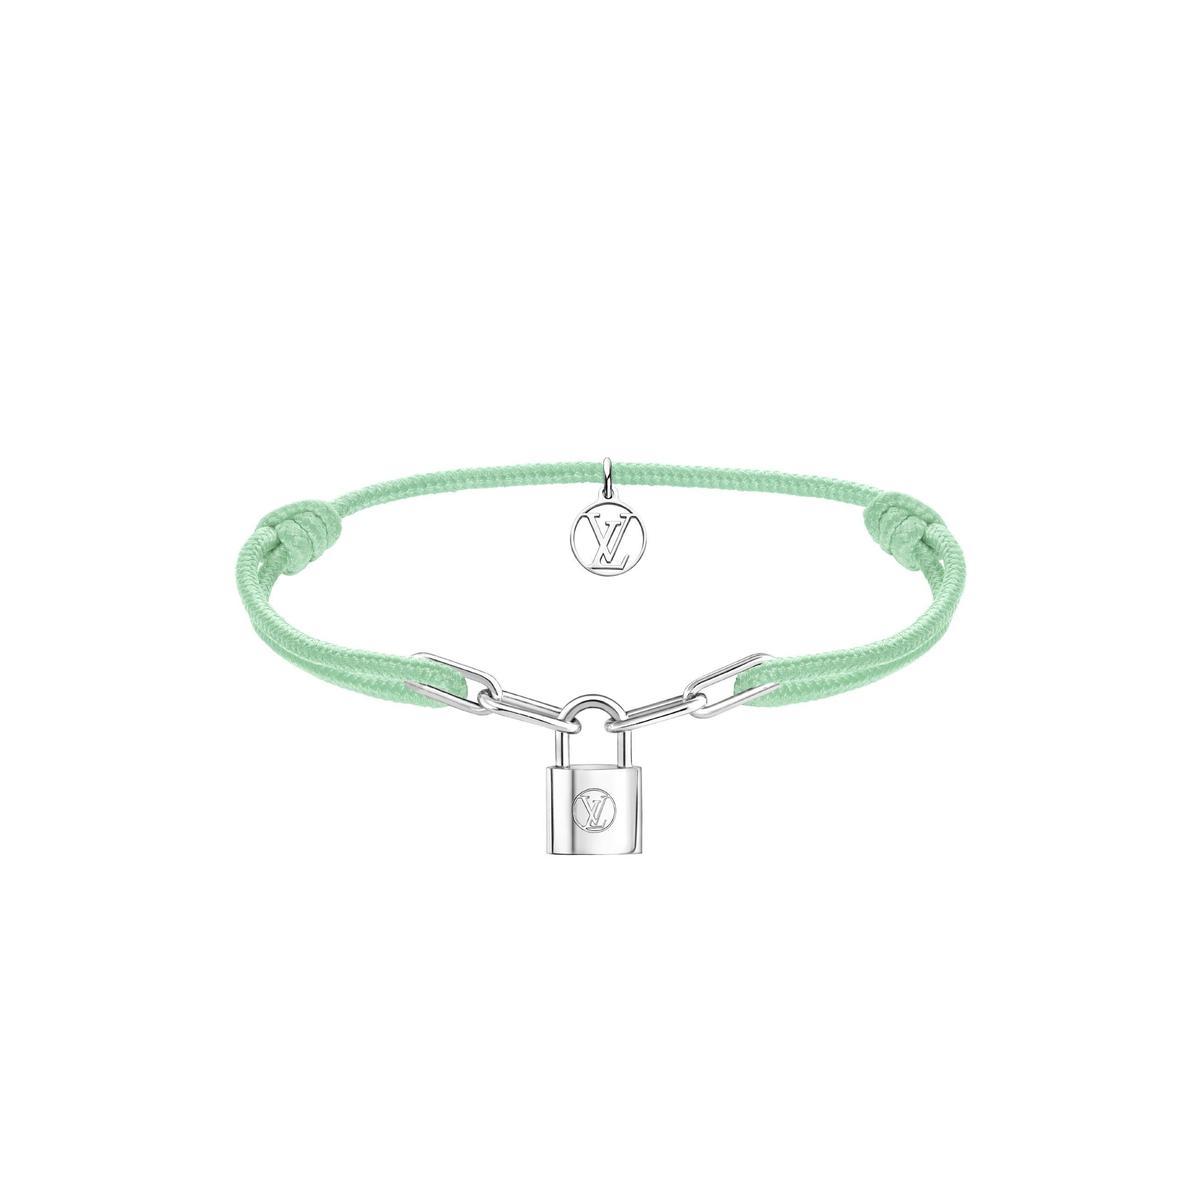 青瓷綠Silver Lockit。NT$13,500(路易威登提供)